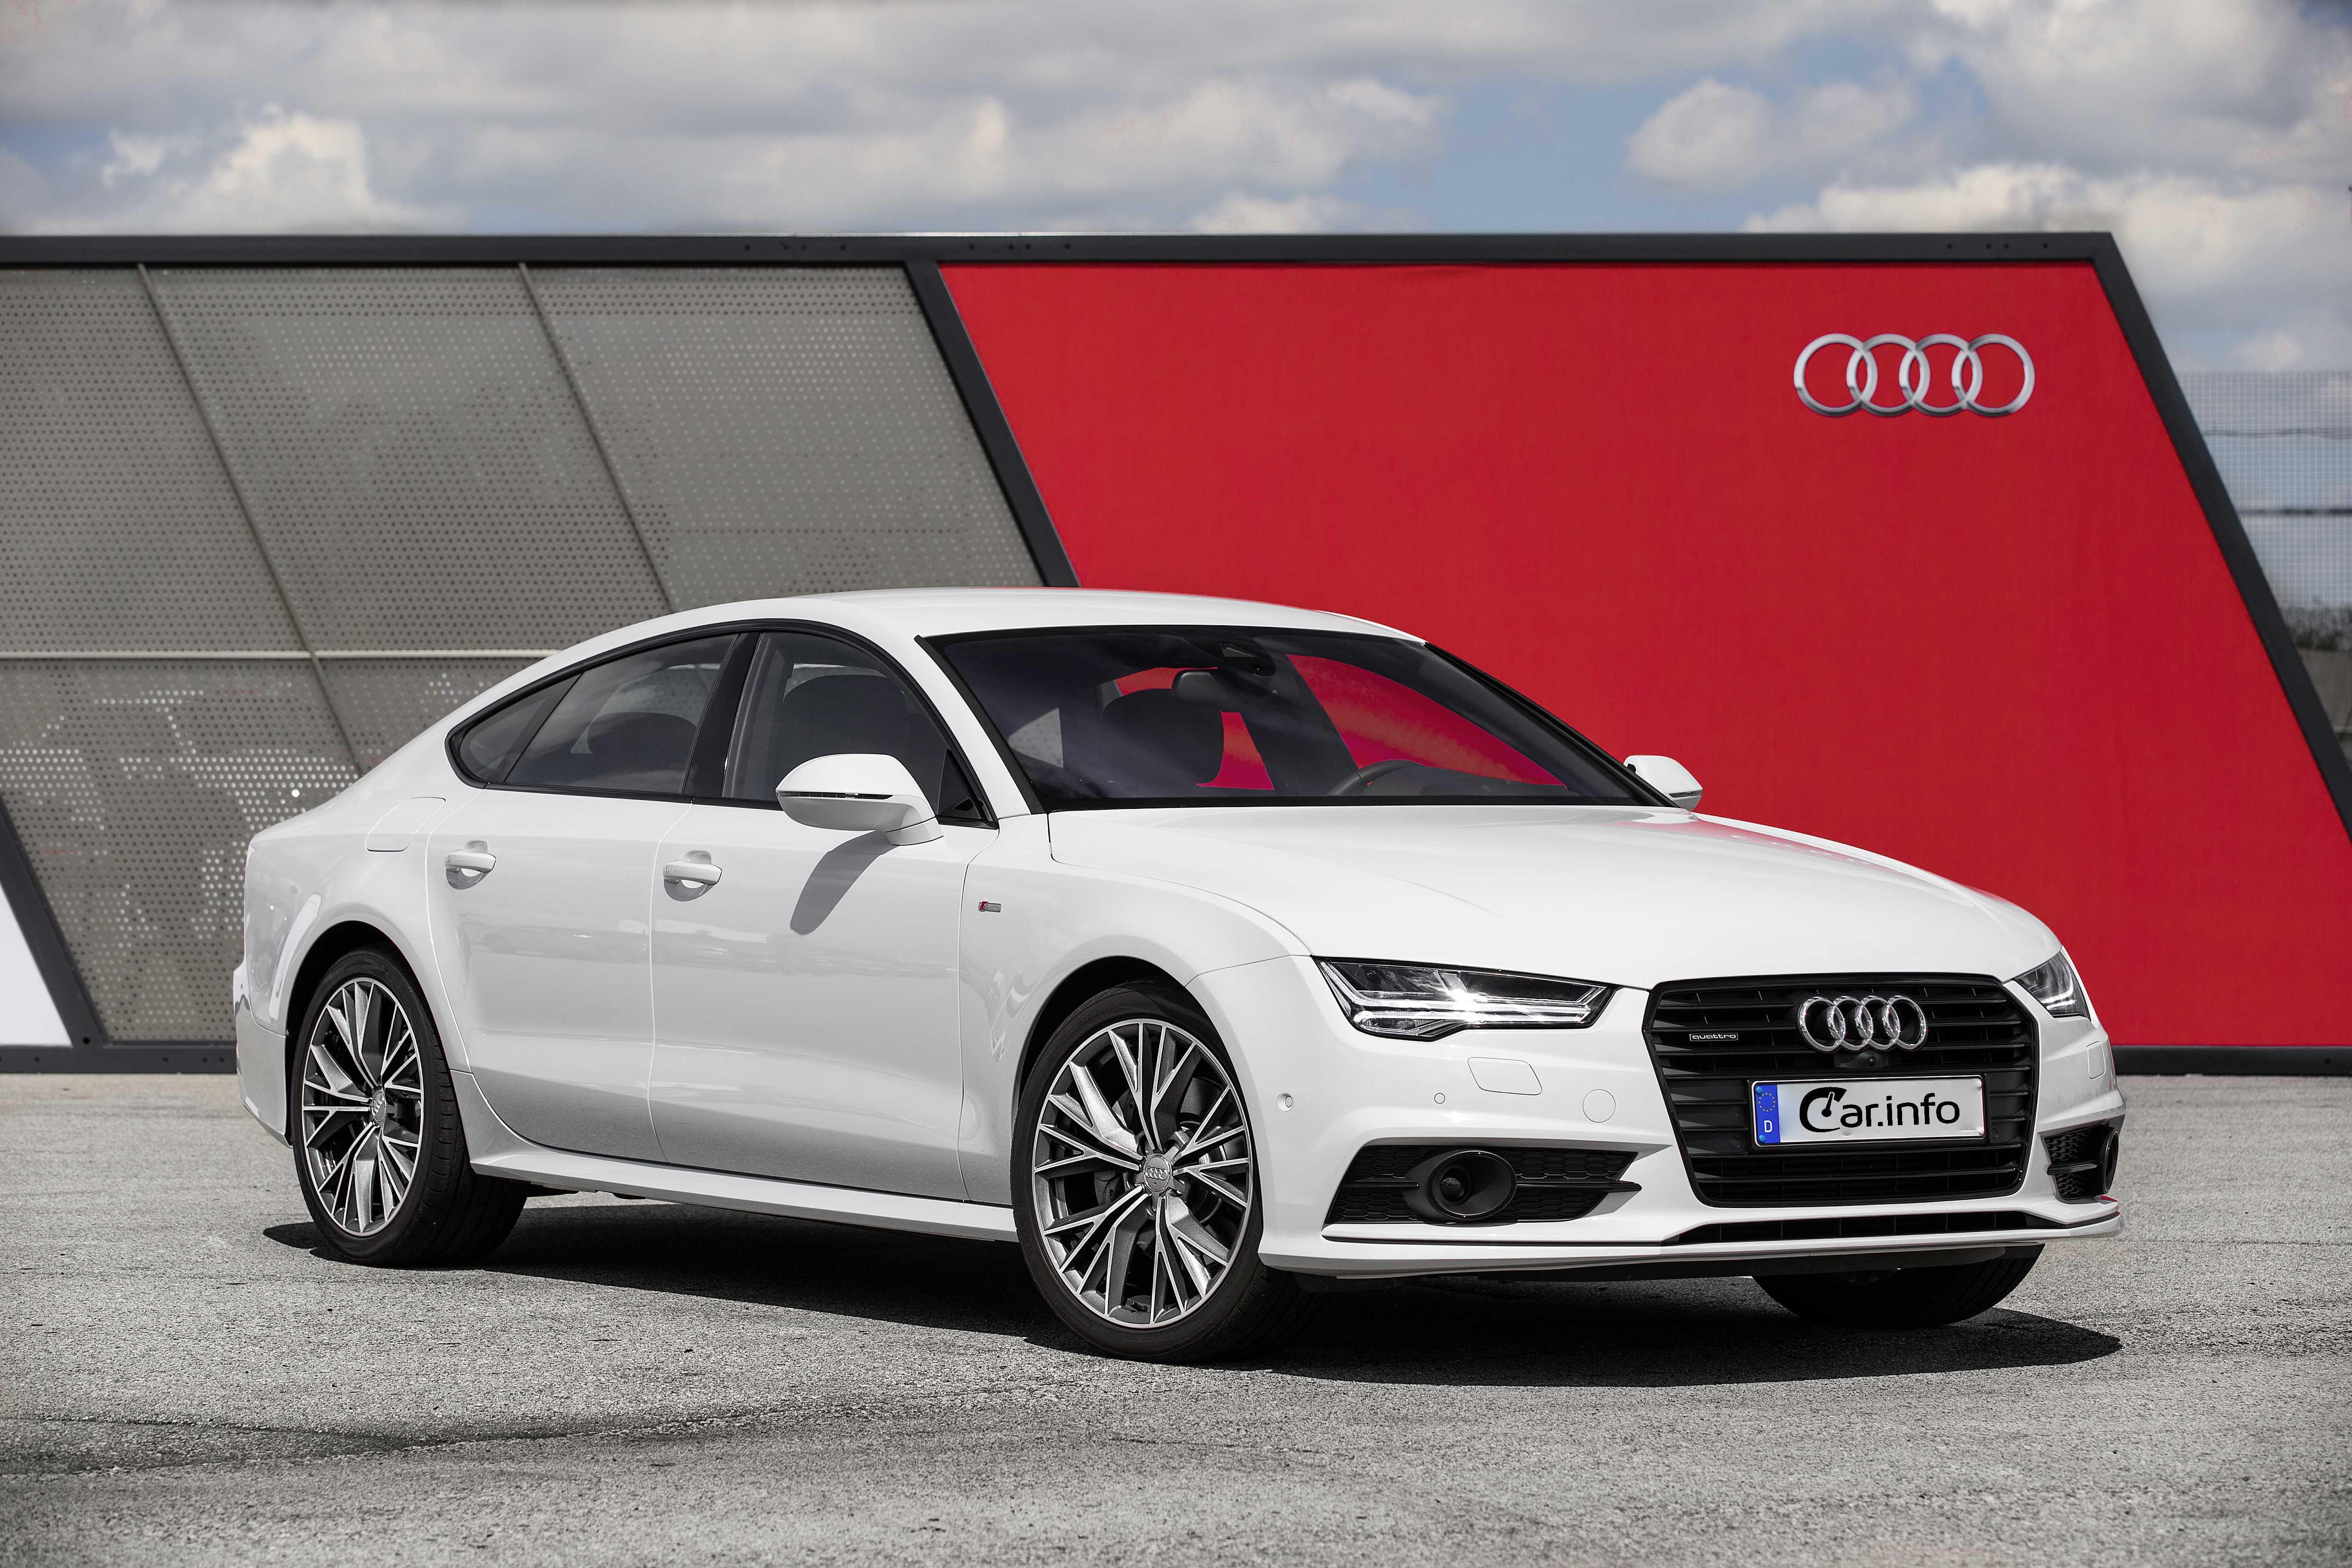 Kekurangan Audi A7 2015 Tangguh